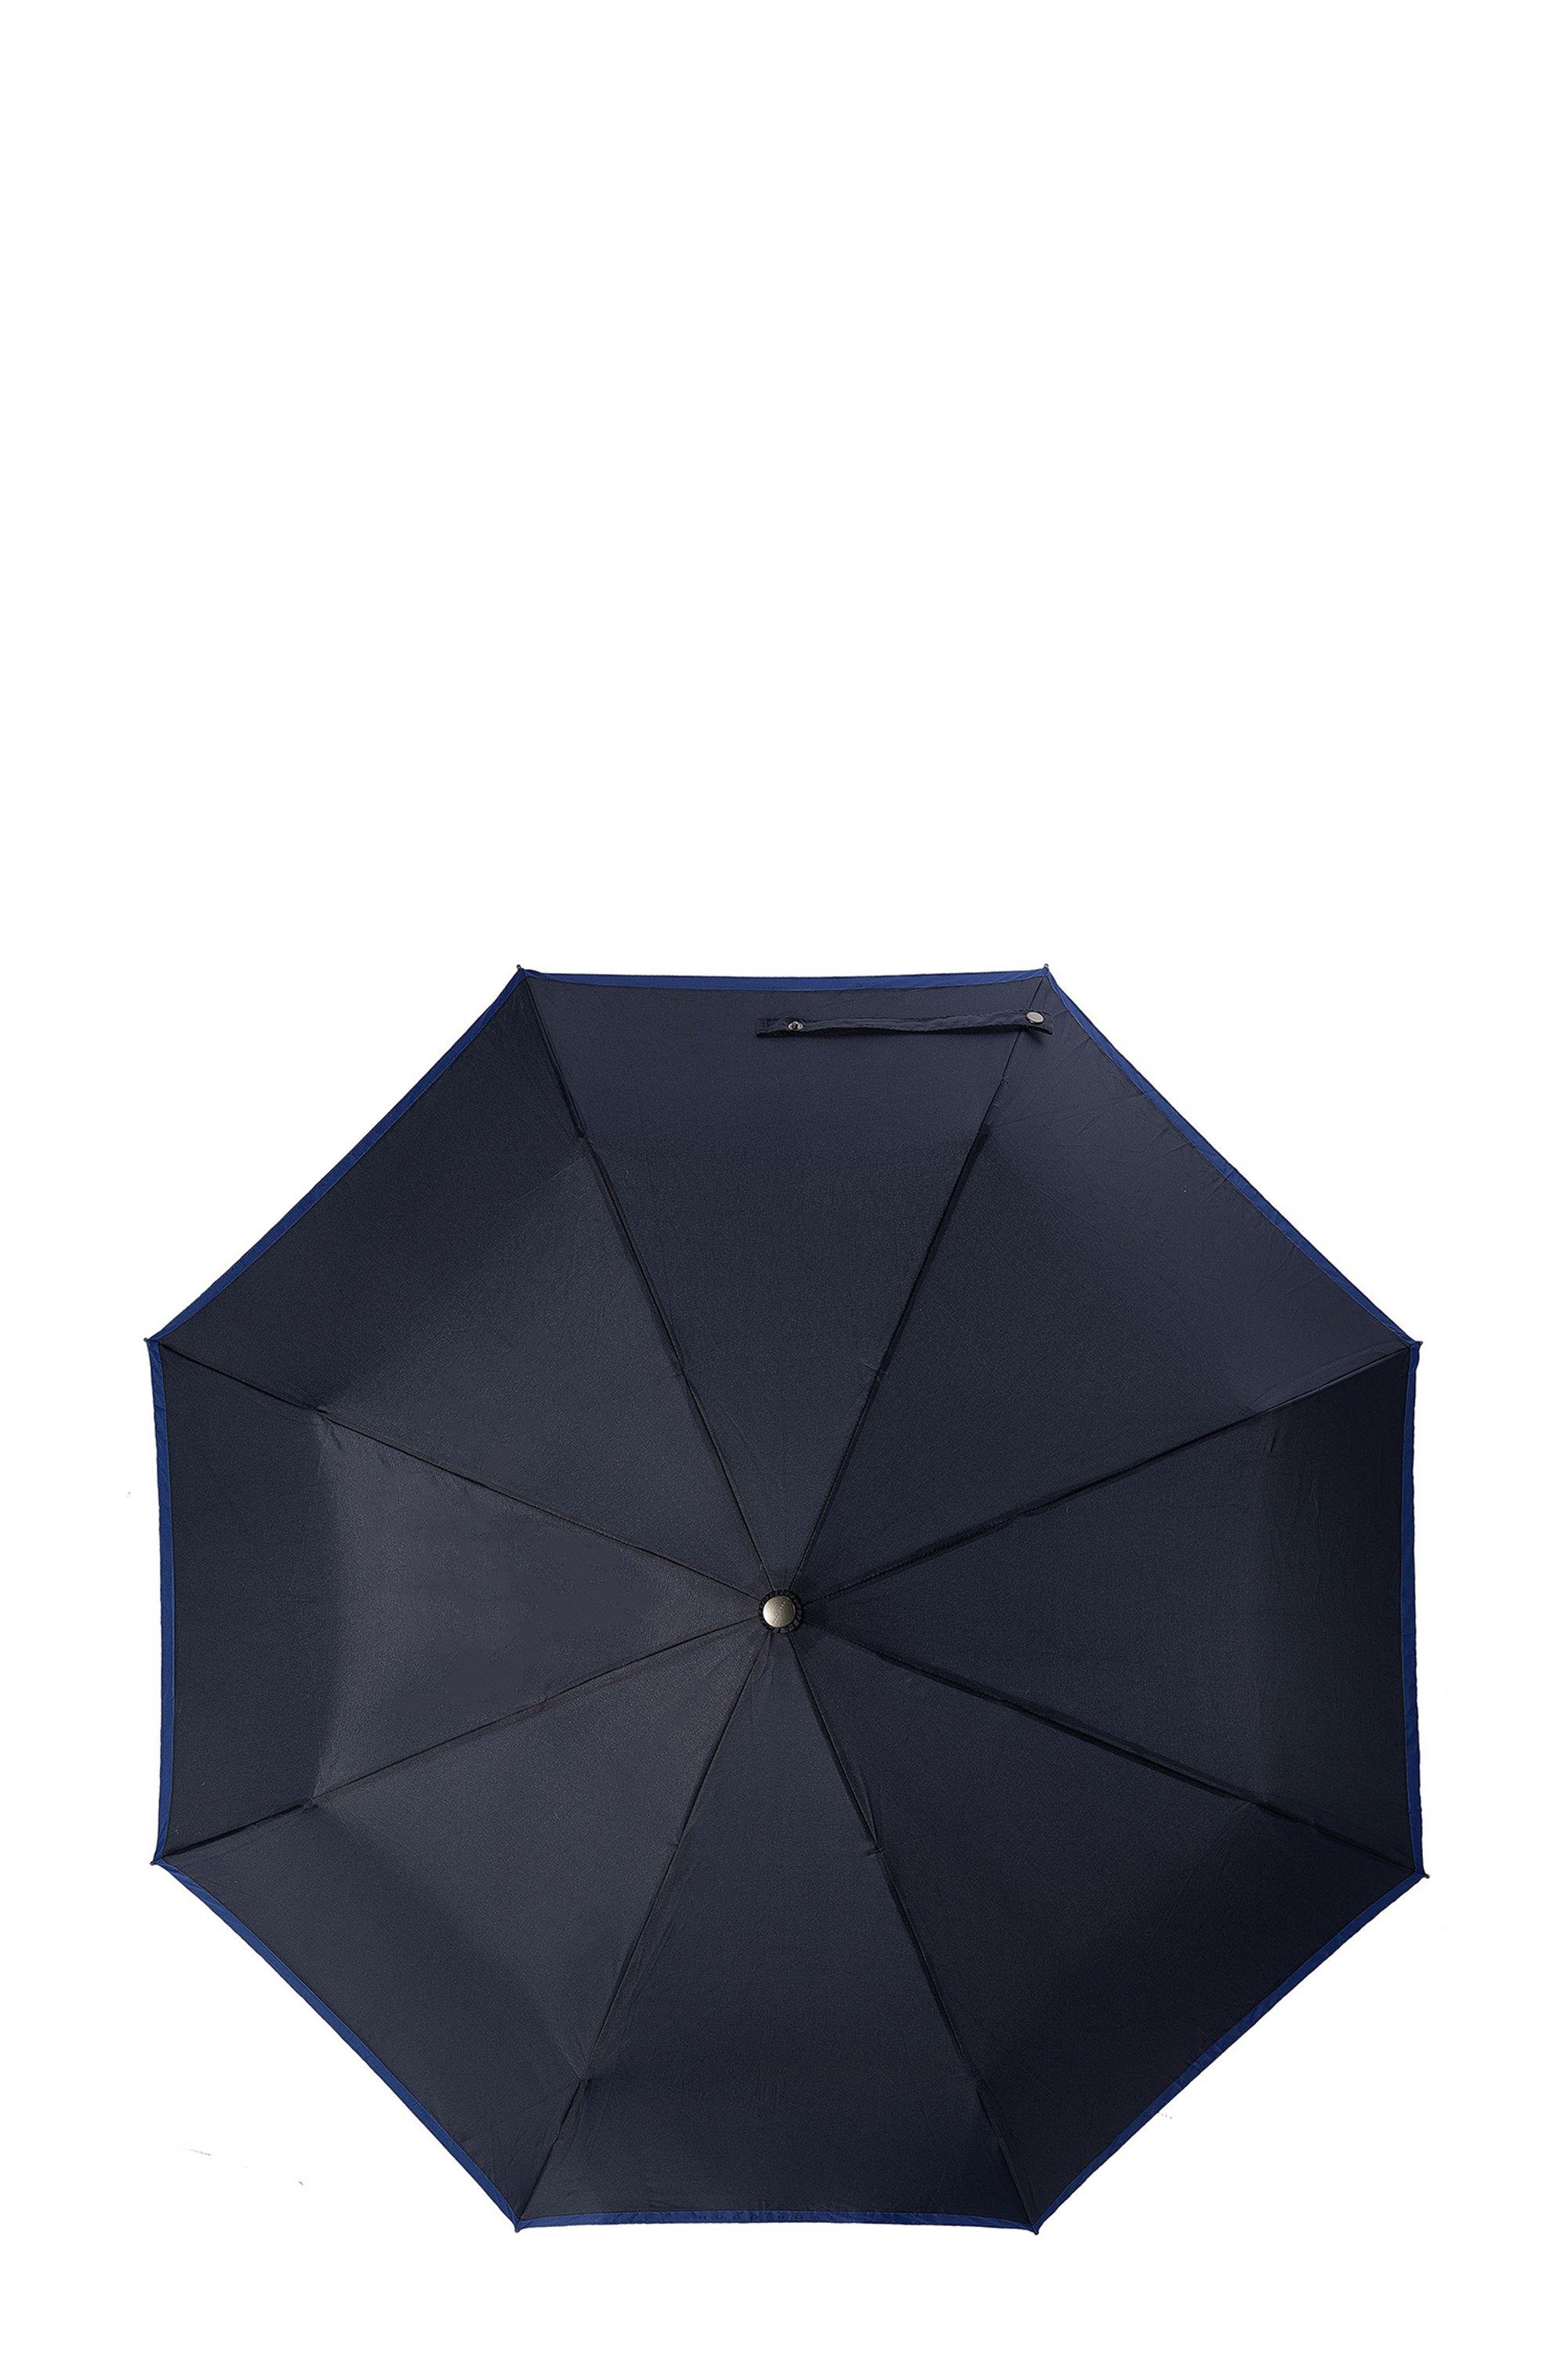 Pocket umbrella with blue border